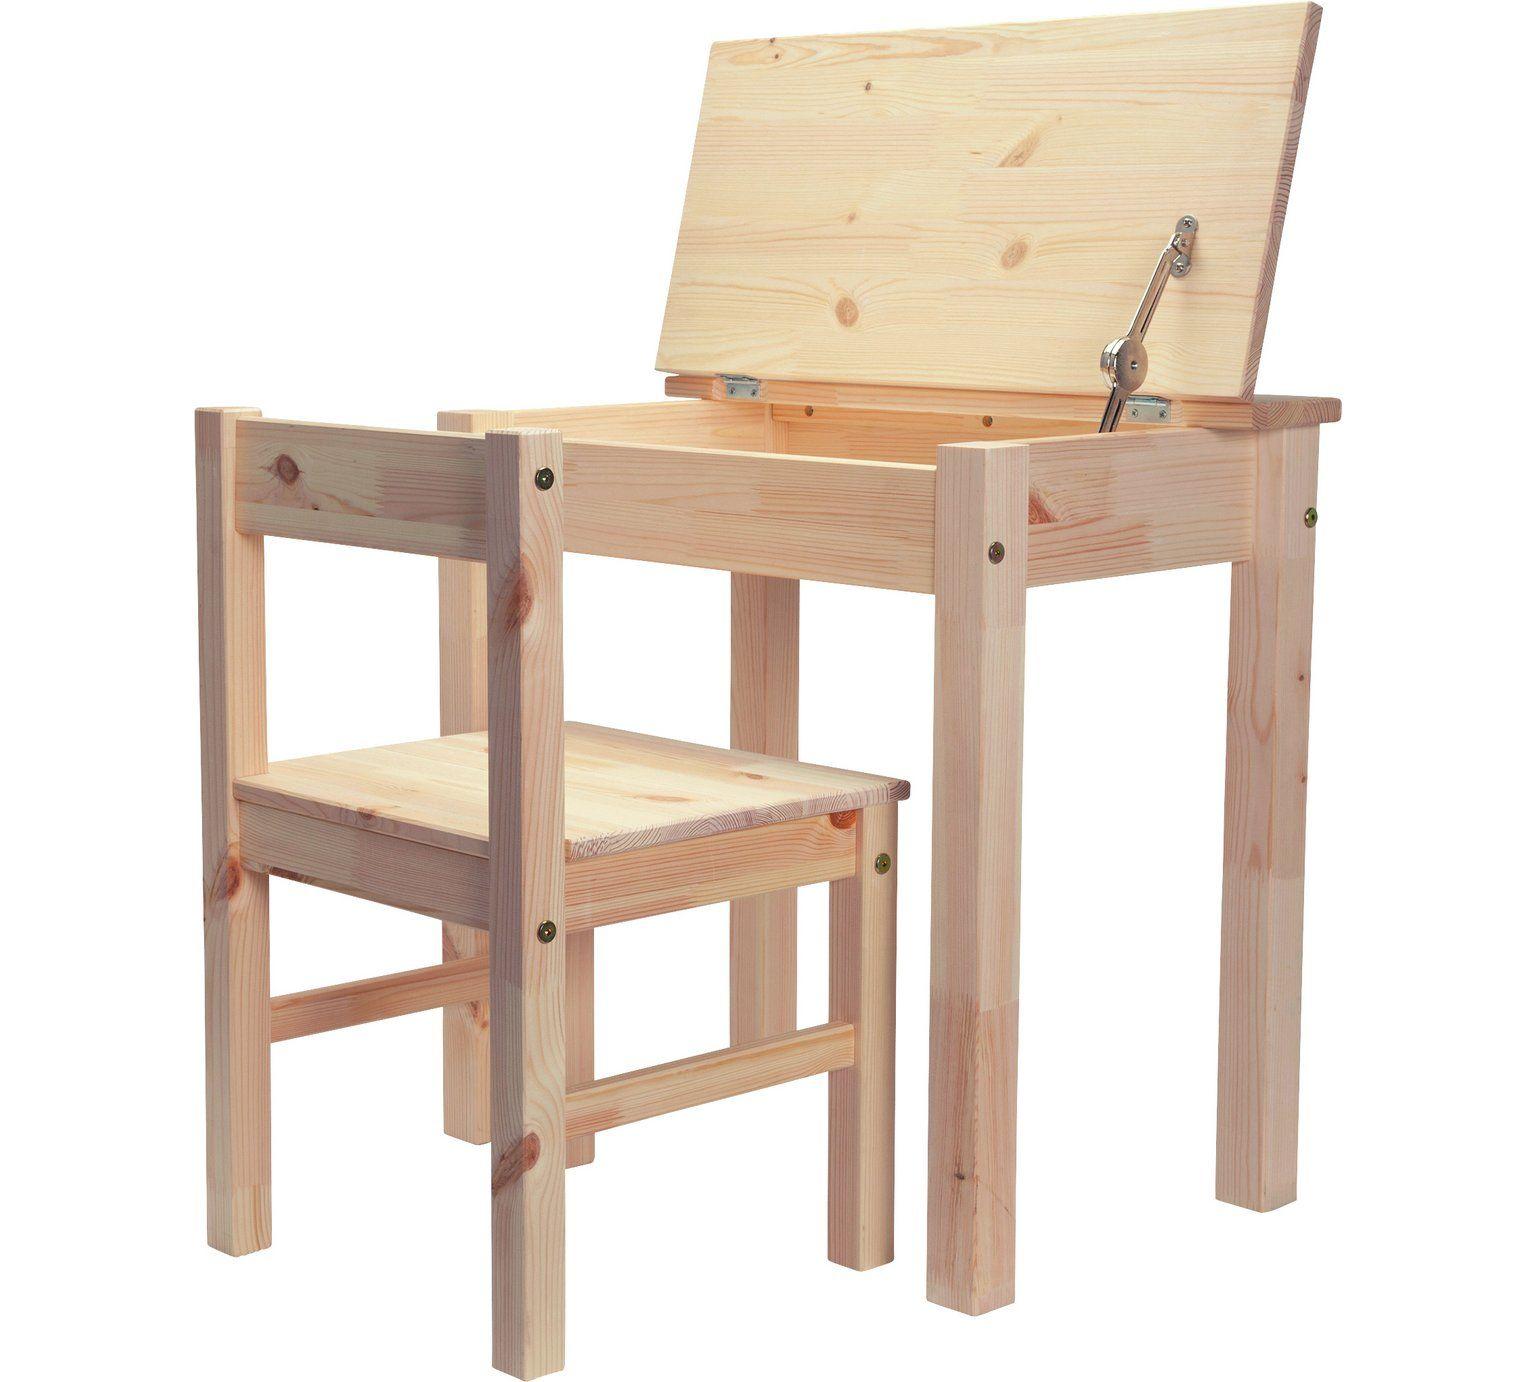 Argos Childrens Garden Table And Chairs: Buy Argos Home Scandinavia Desk & Chair - Pine